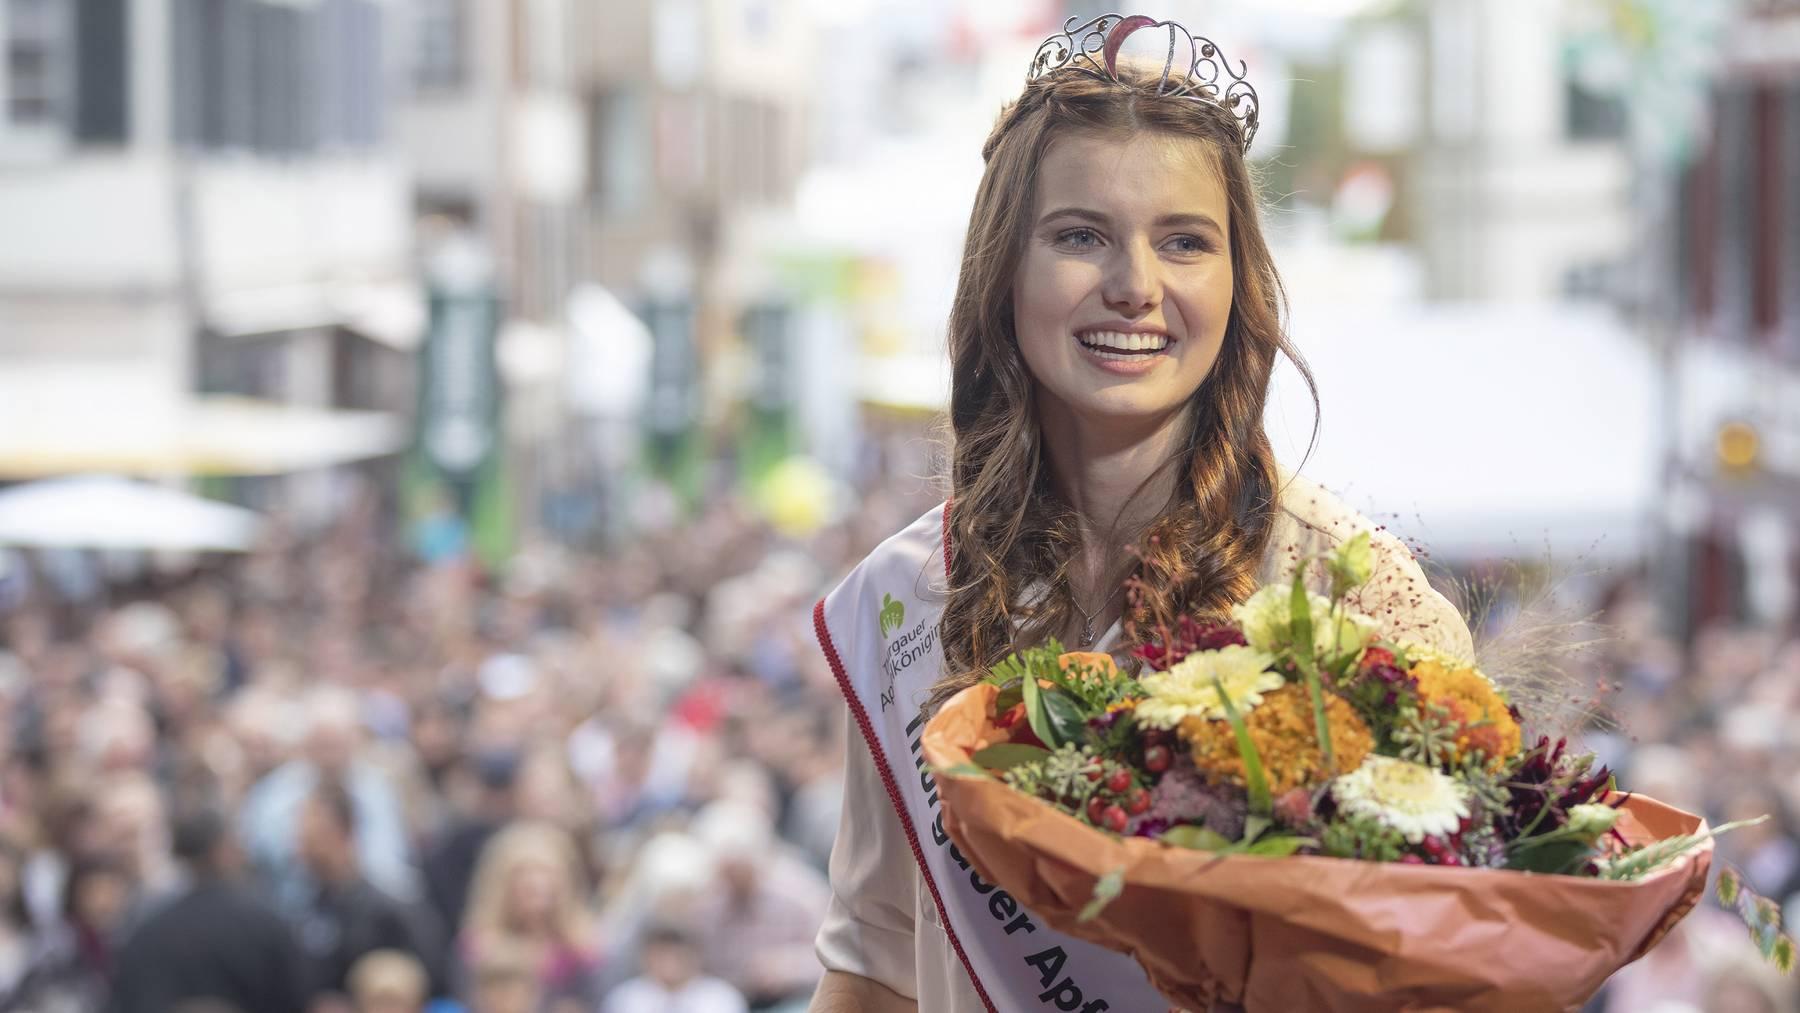 Thurgauer Apfelkoenigin 2019/2020 Larissa Häberli